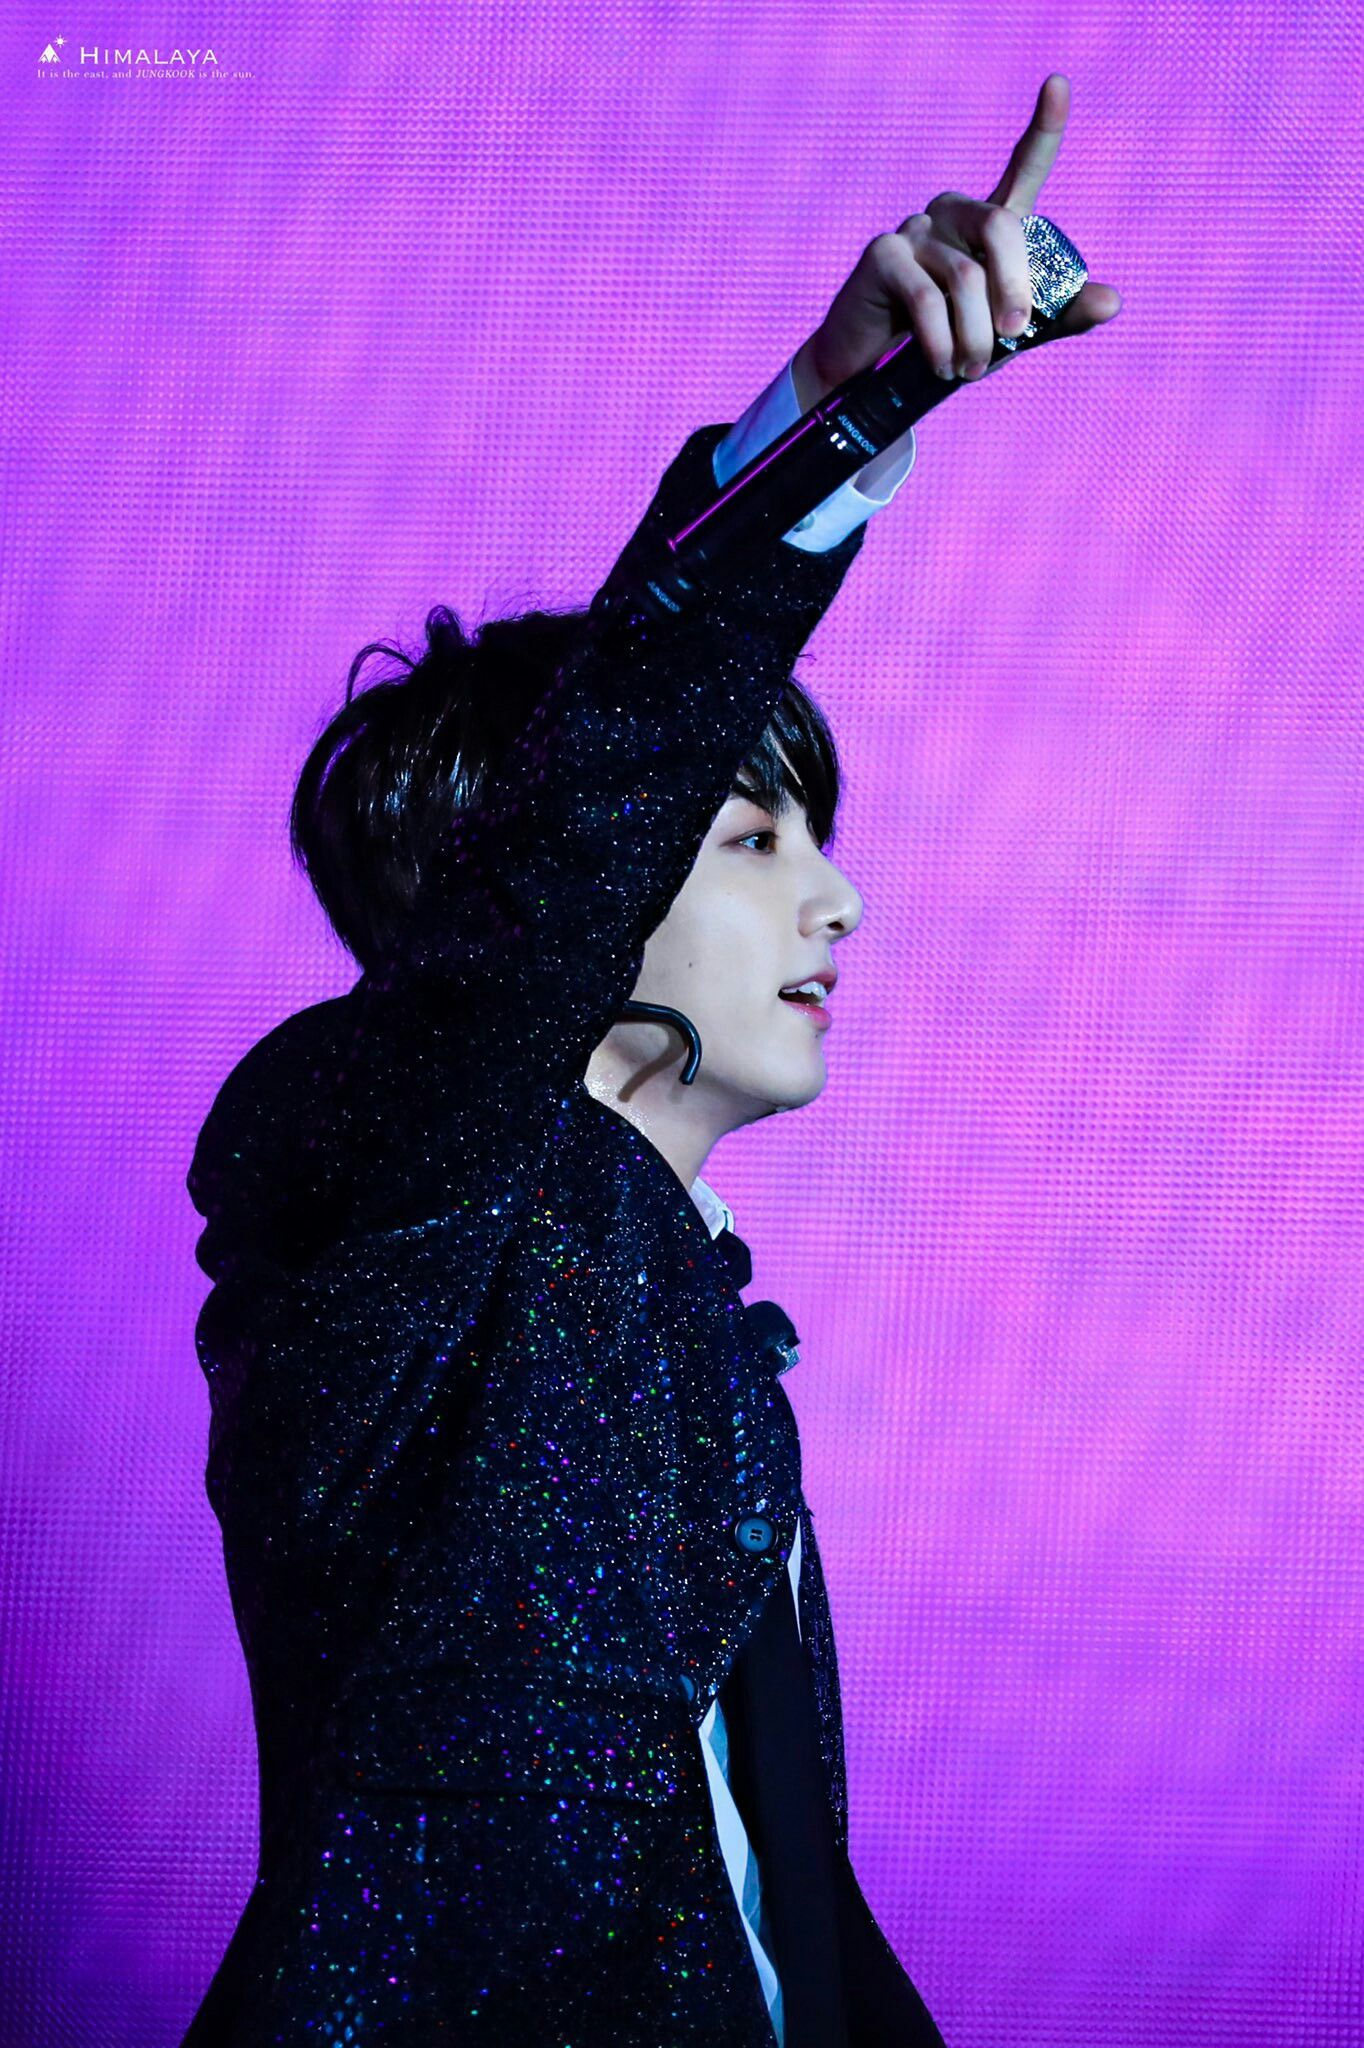 181209 #BTS LY Tour in Taoyuan. Taipei Taiwan Day 2 #JUNGKOOK | ジョングク. グク